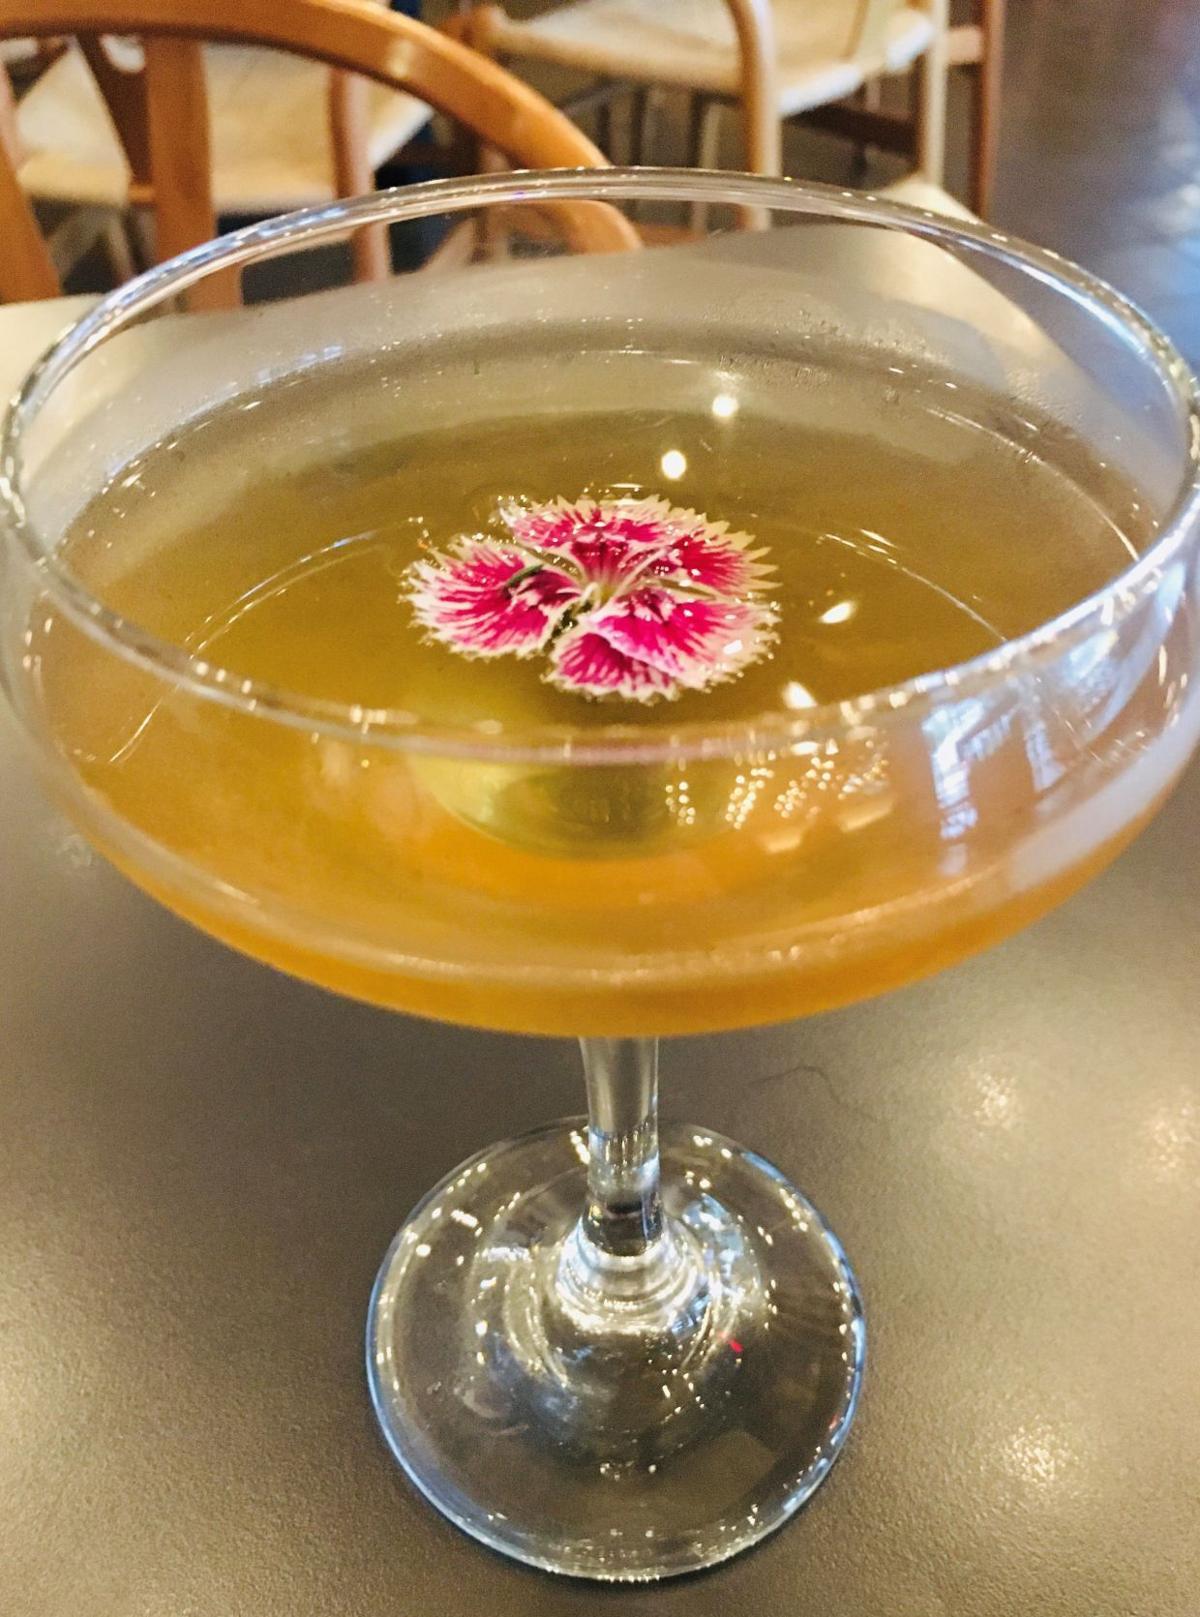 20210721-gm-foodguy-Apri-Love cocktail from Paulina Escandes Gourmandize.jpg